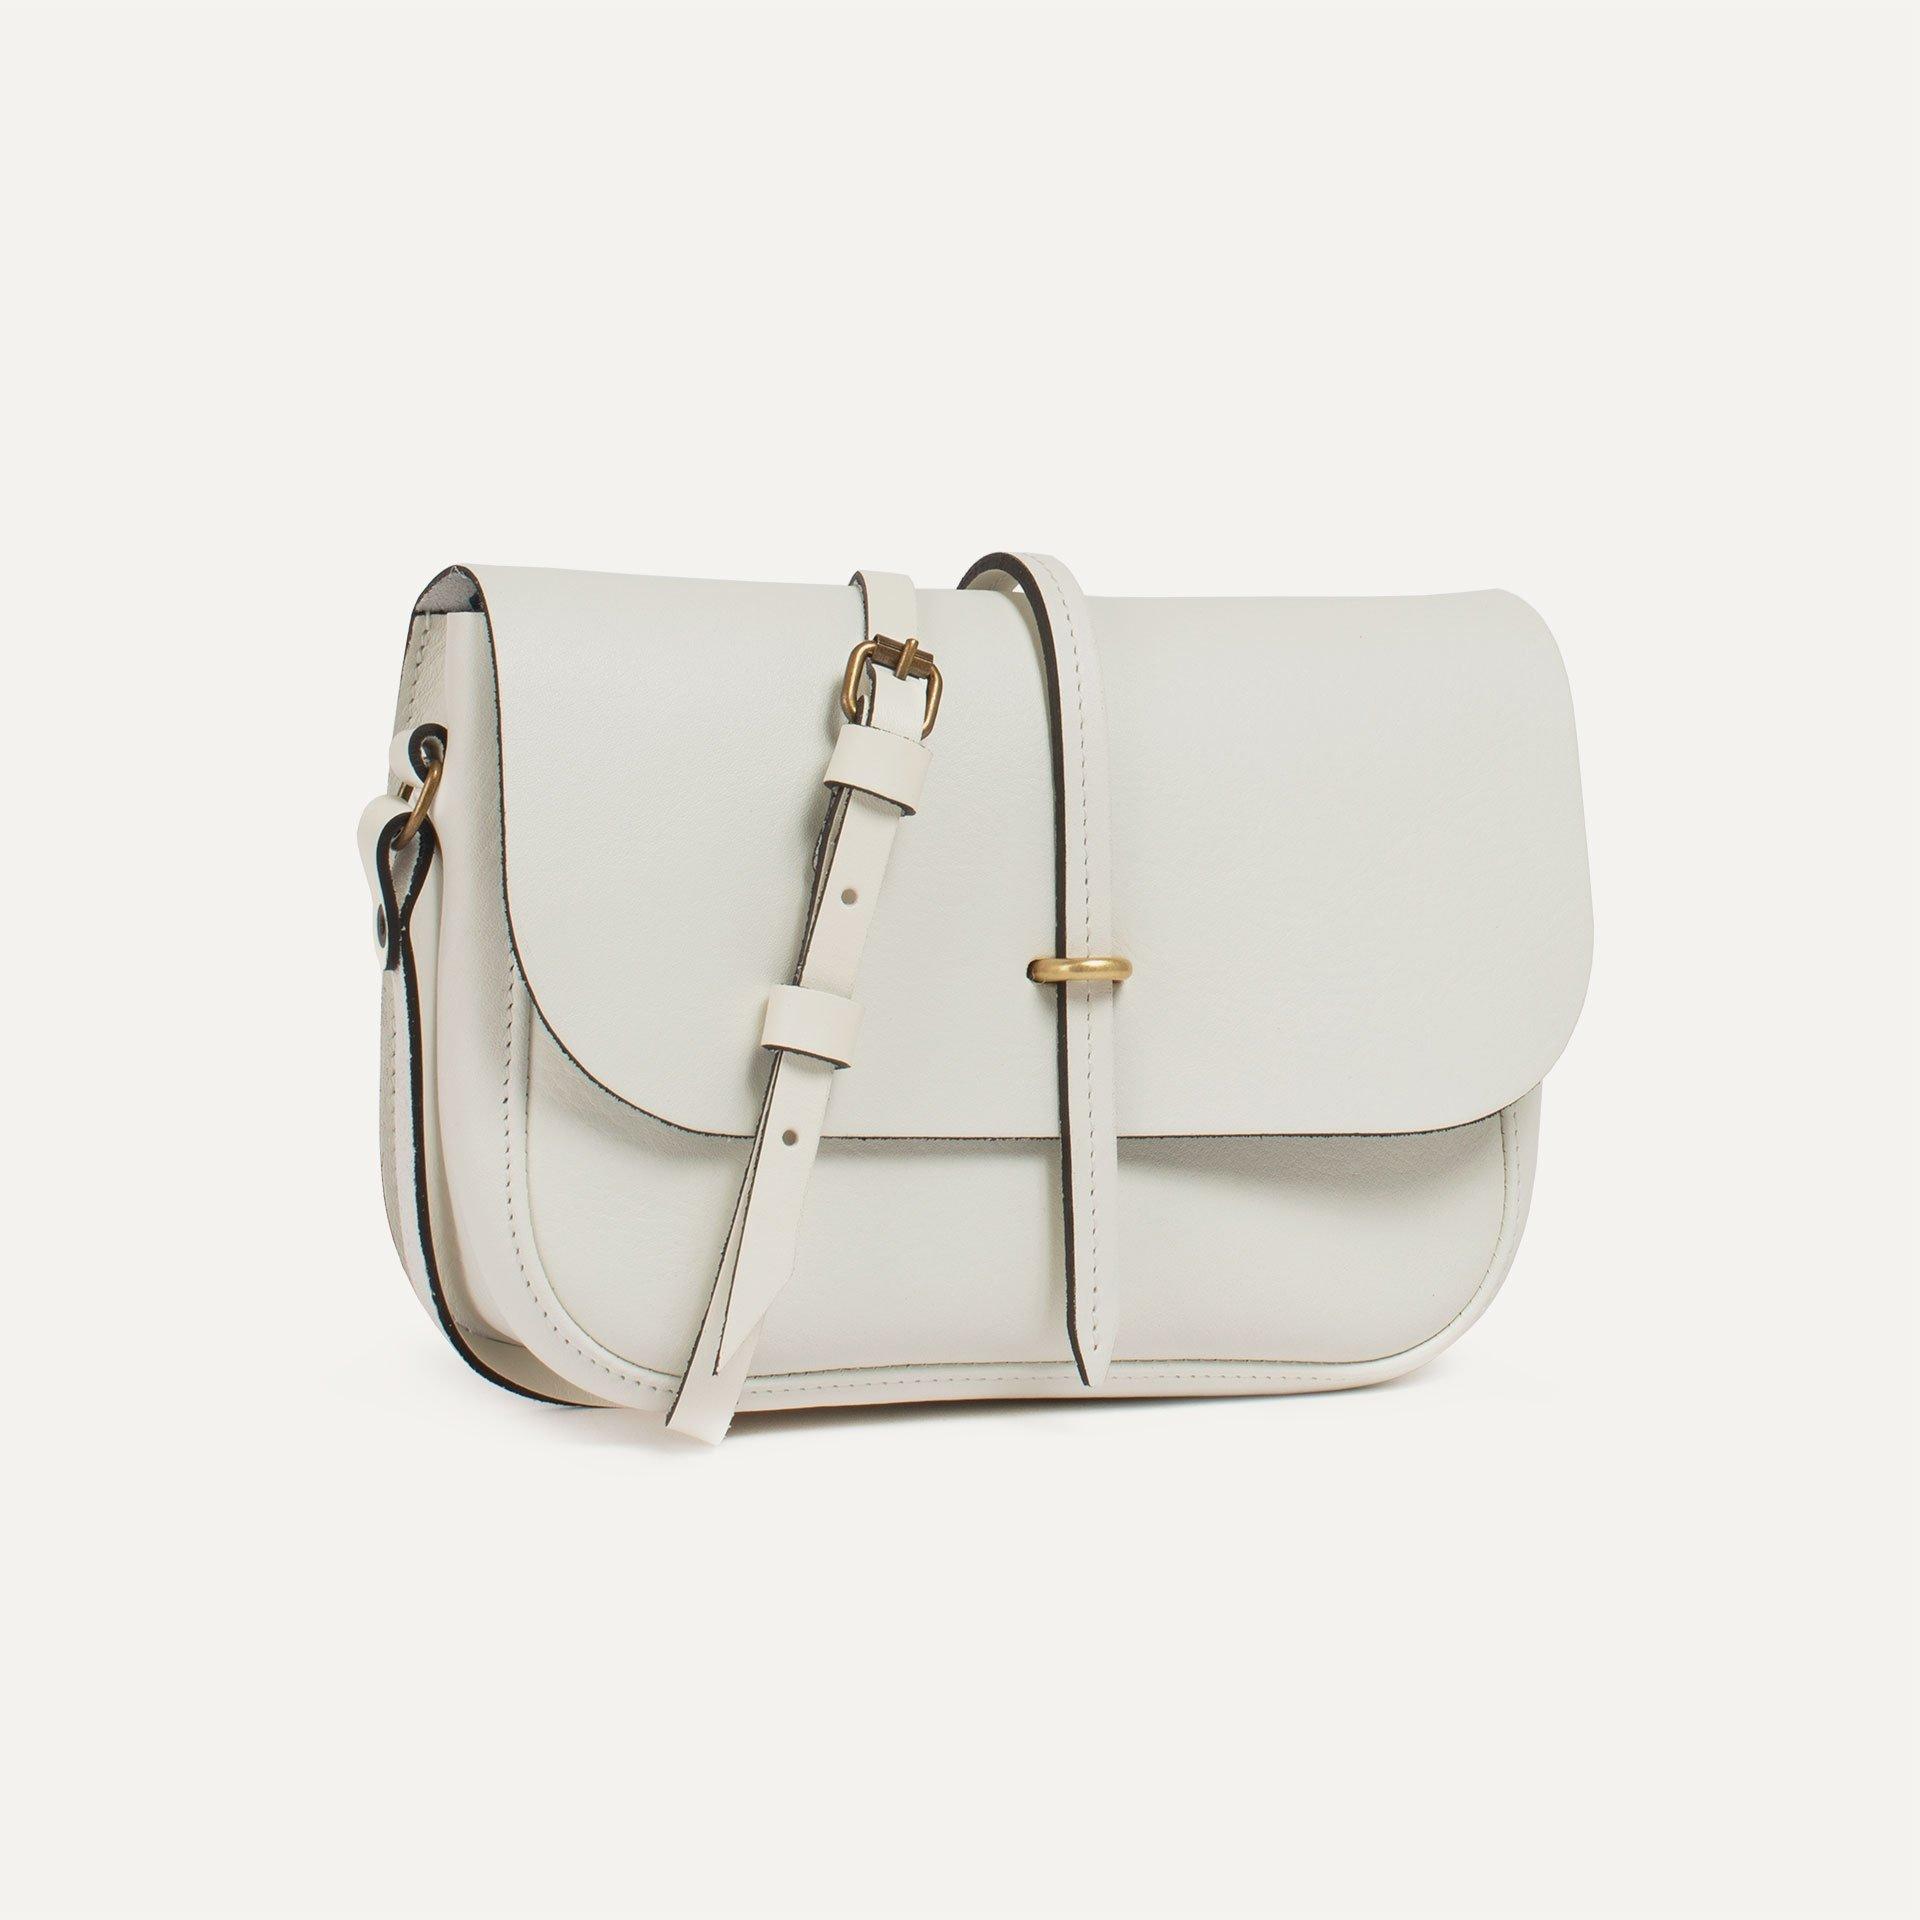 Pastis handbag - White (image n°2)